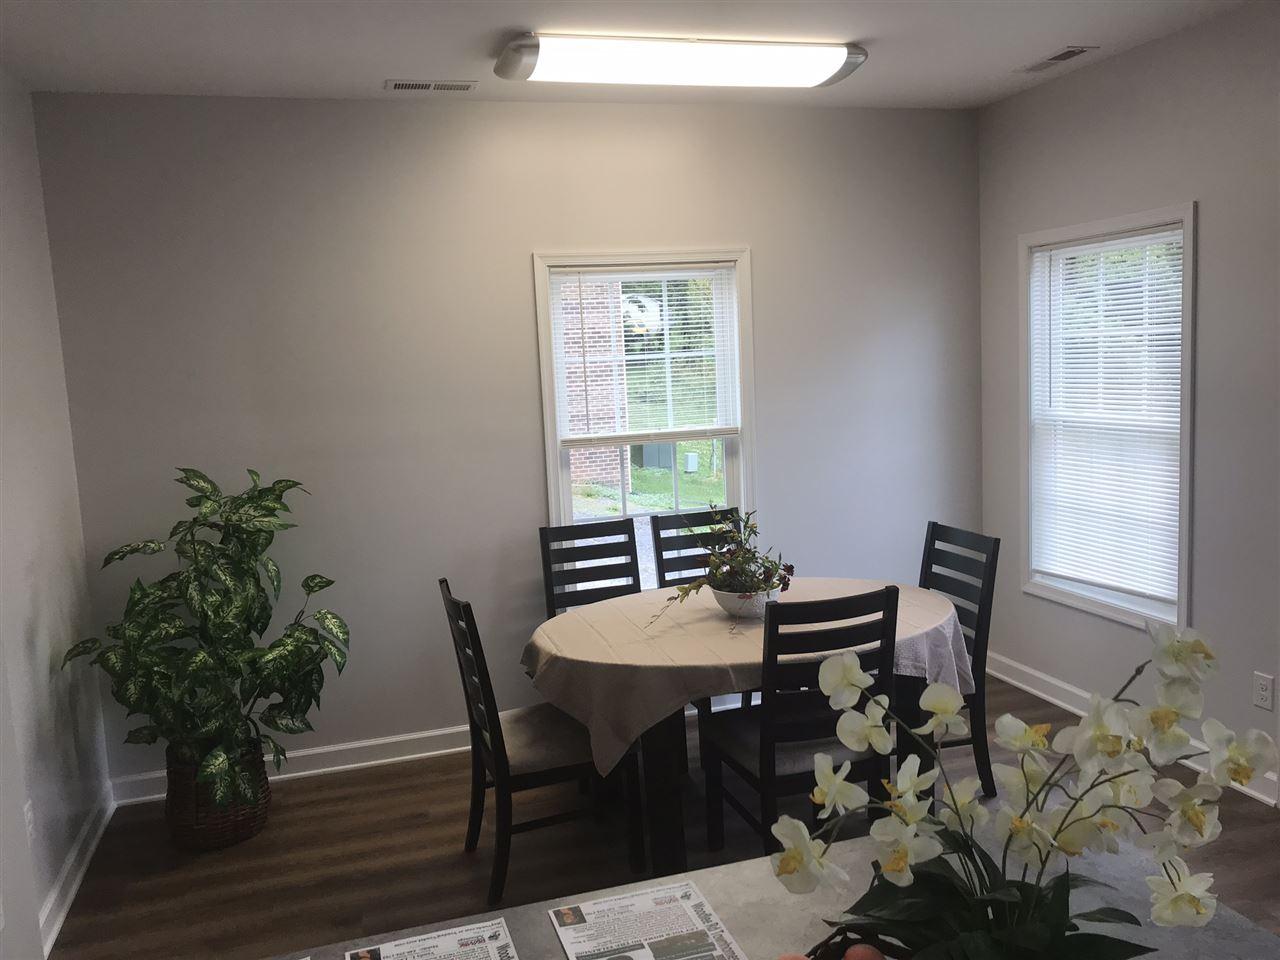 63 Woodlee Rd, Staunton, VA, 24401